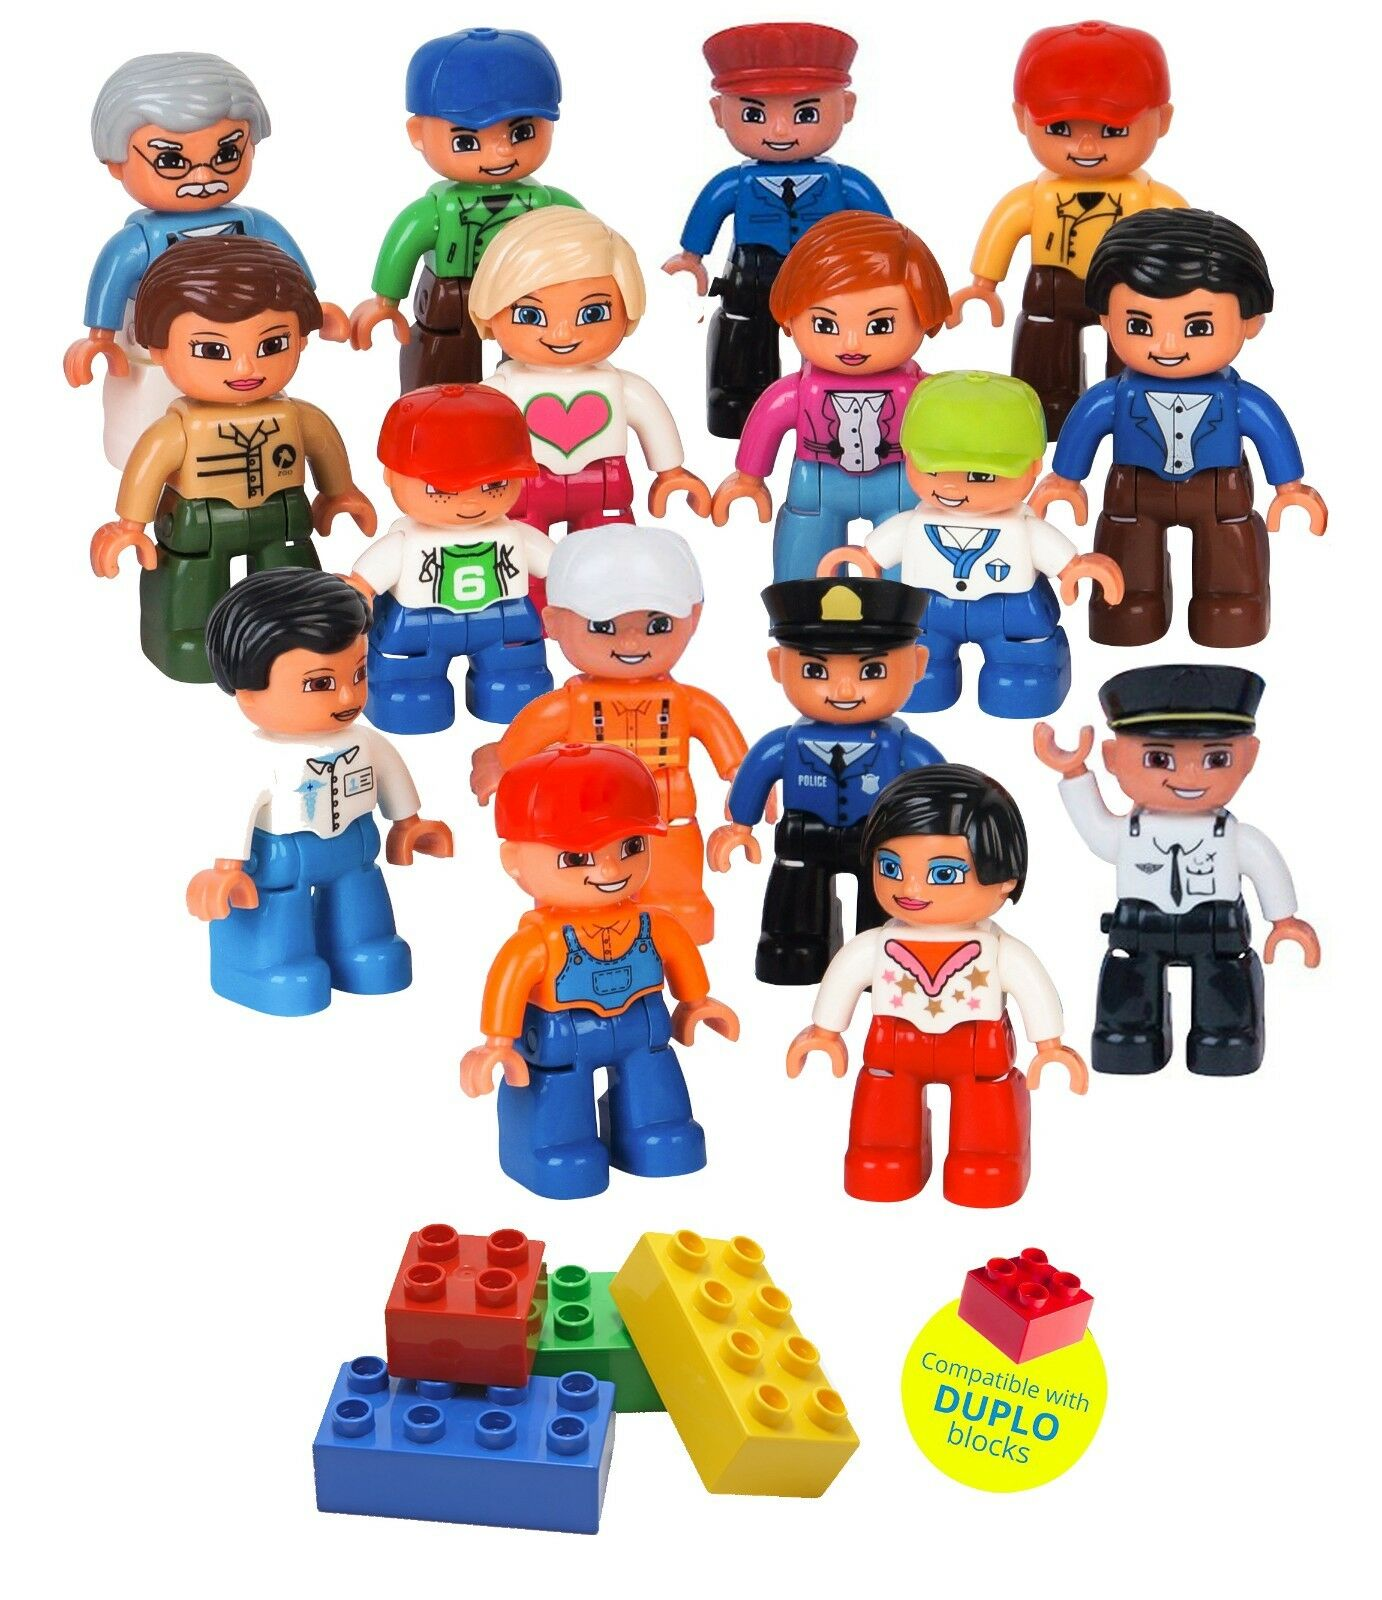 Community figure set set set compatible with (DUPLO) and all major brands 321025